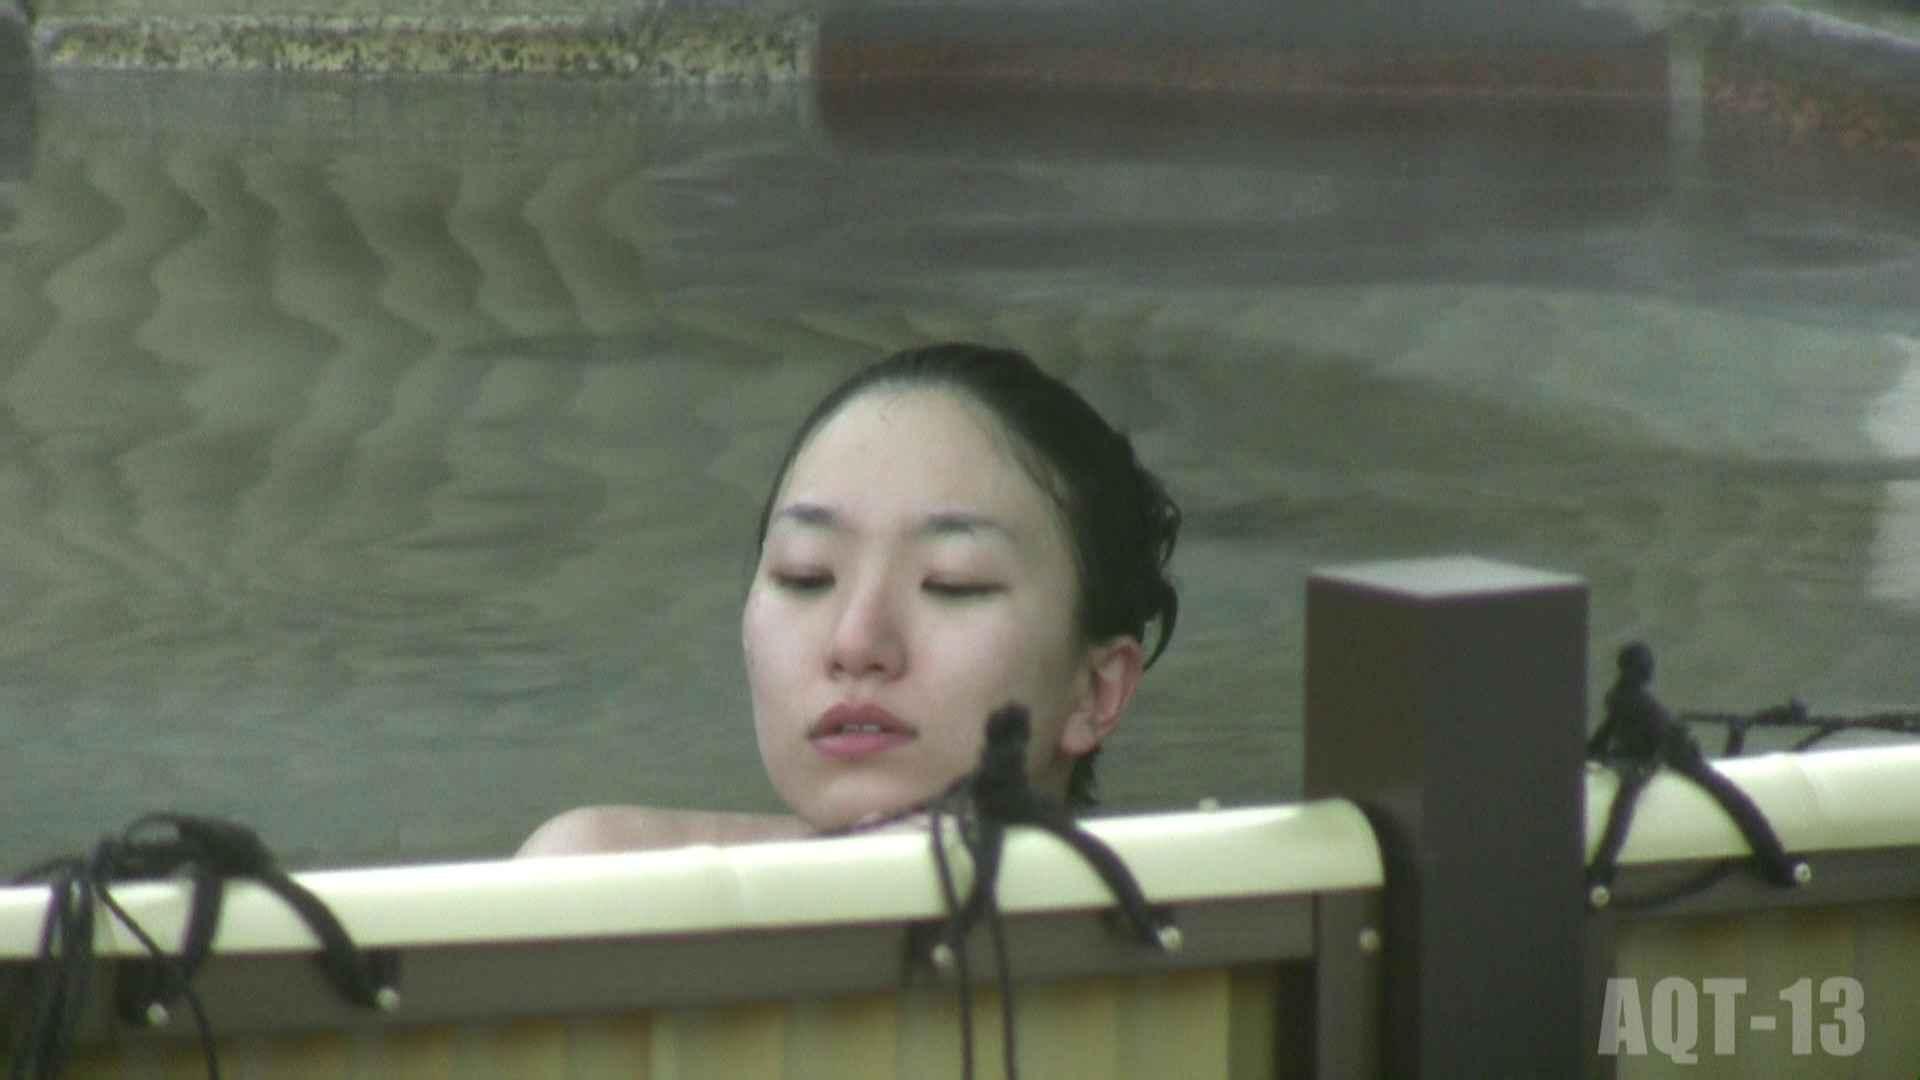 Aquaな露天風呂Vol.818 露天風呂突入 盗み撮り動画キャプチャ 71pic 32